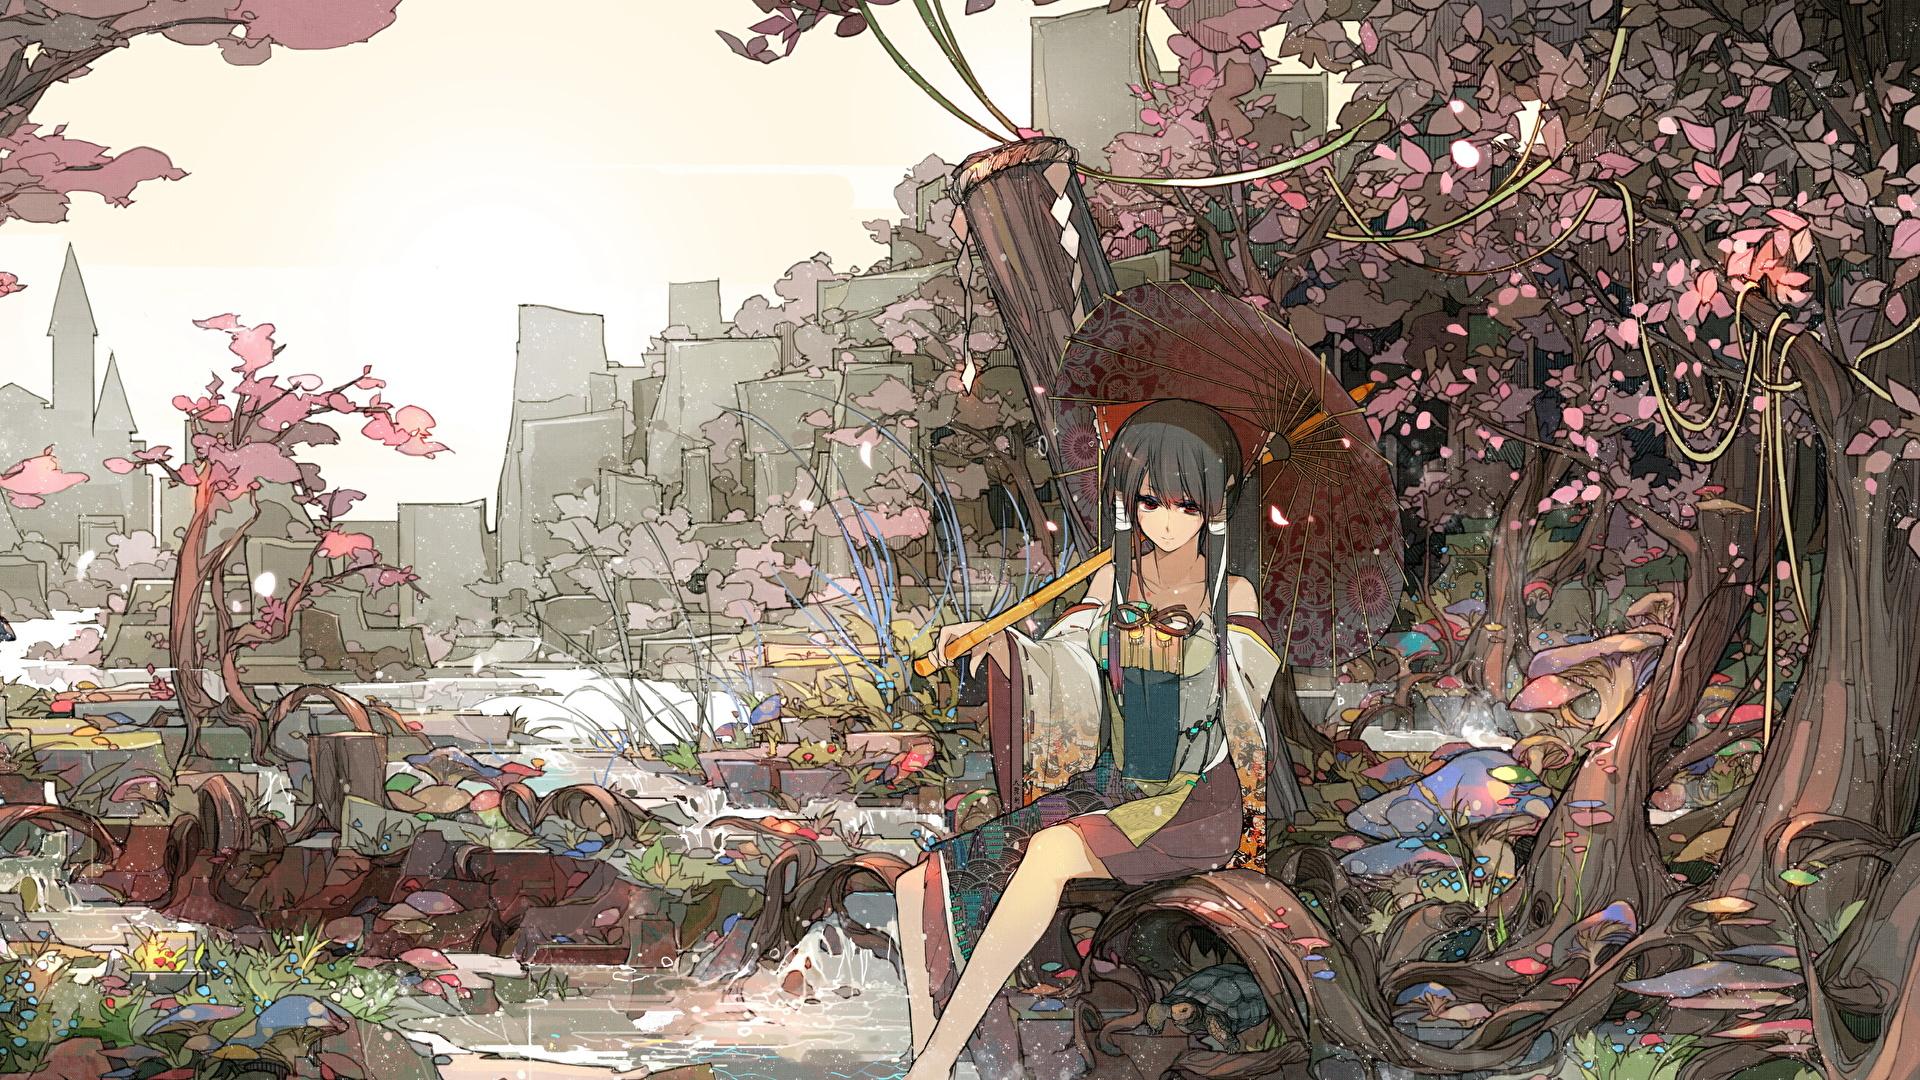 Wallpaper Anime 1920x1080